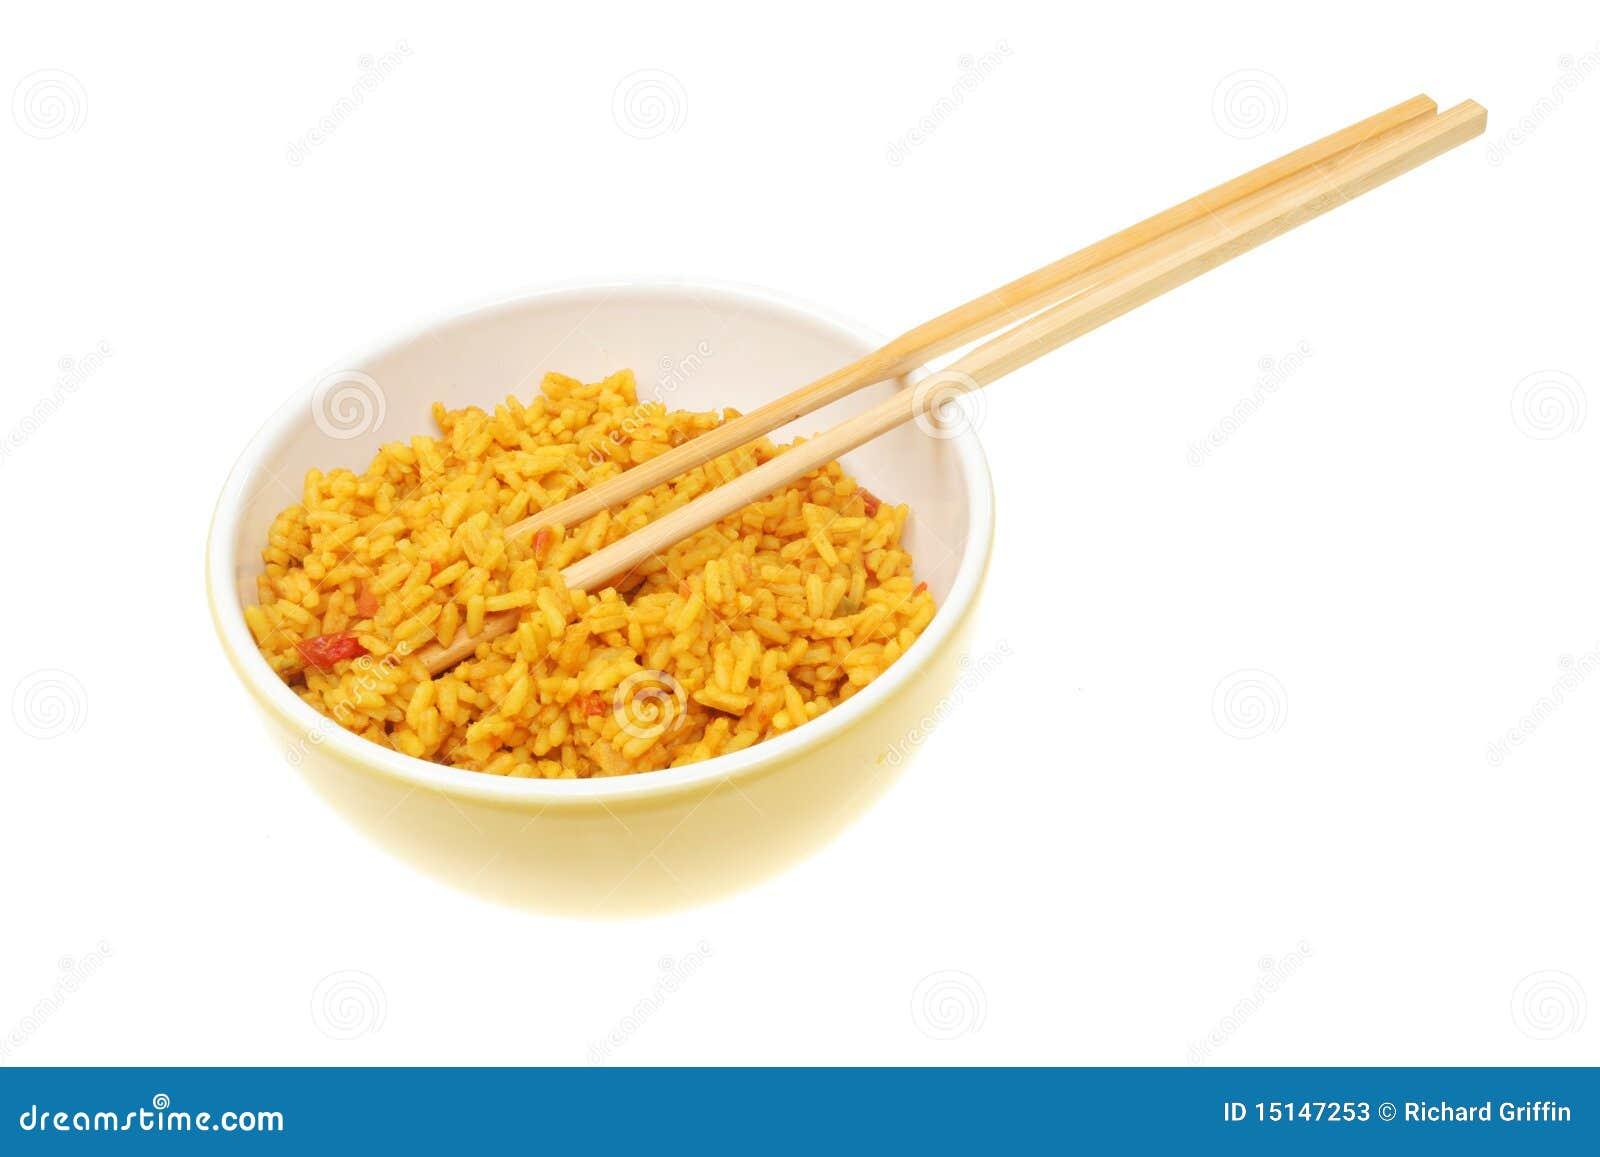 Bowl Of Rice With Chopsticks Stock Photos - Image: 15147253